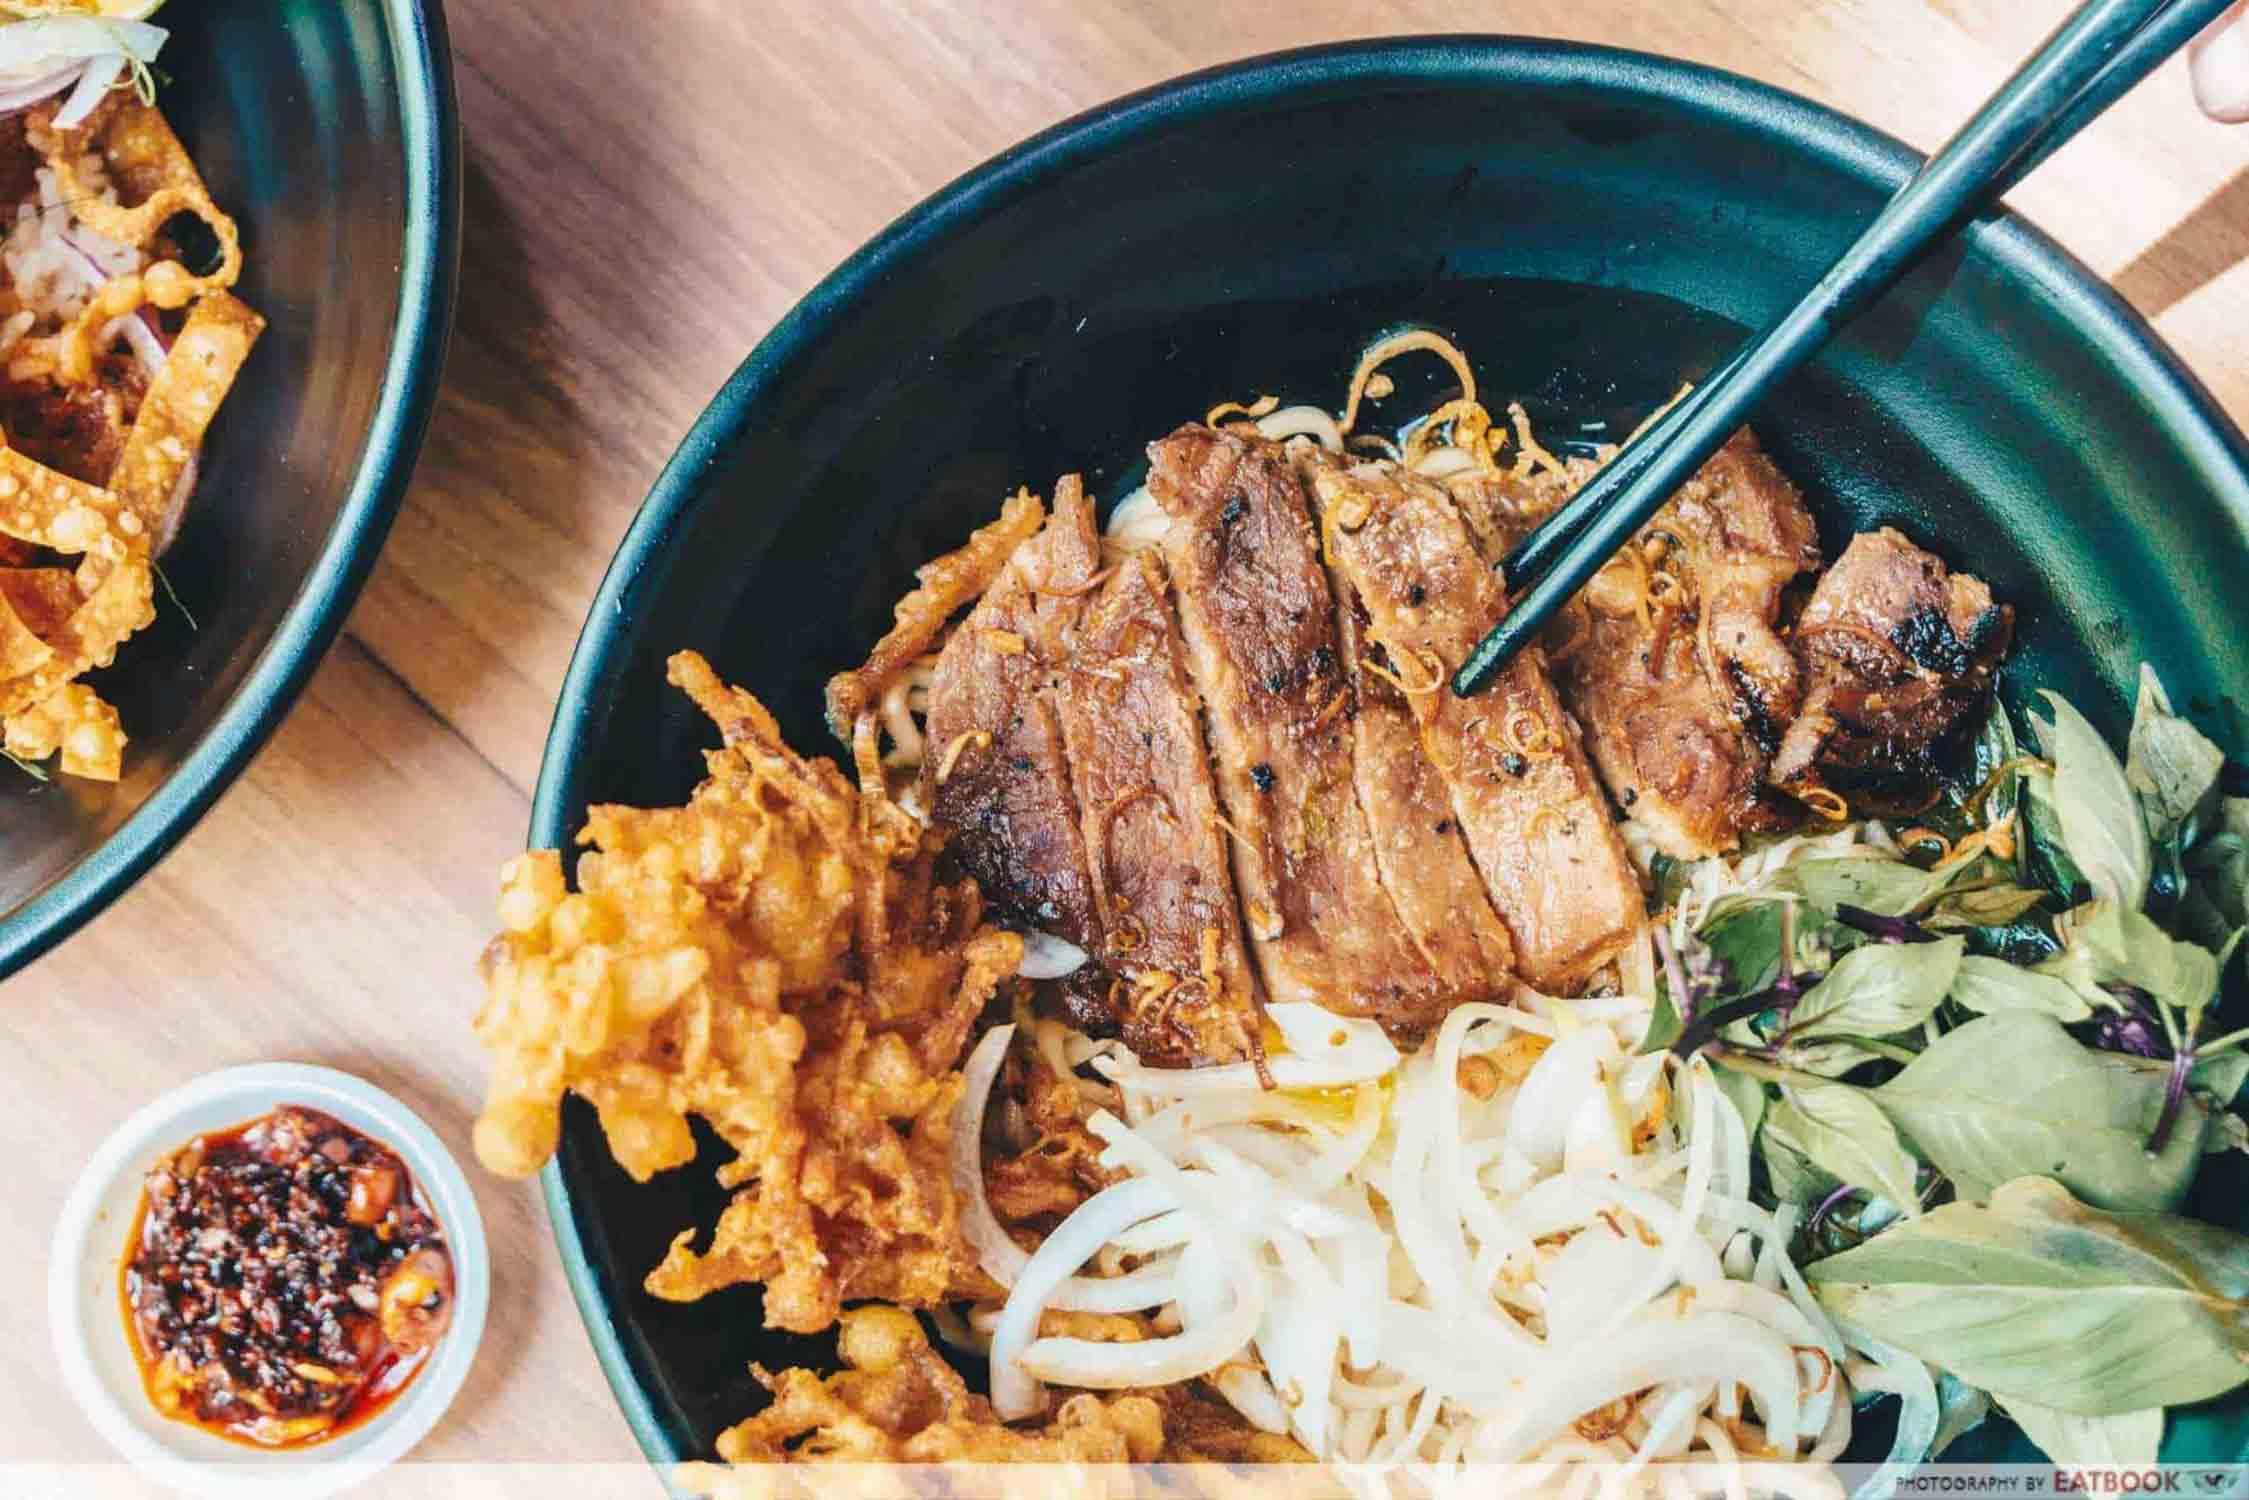 The Leggy Business - Bun Cha Meat Closeup